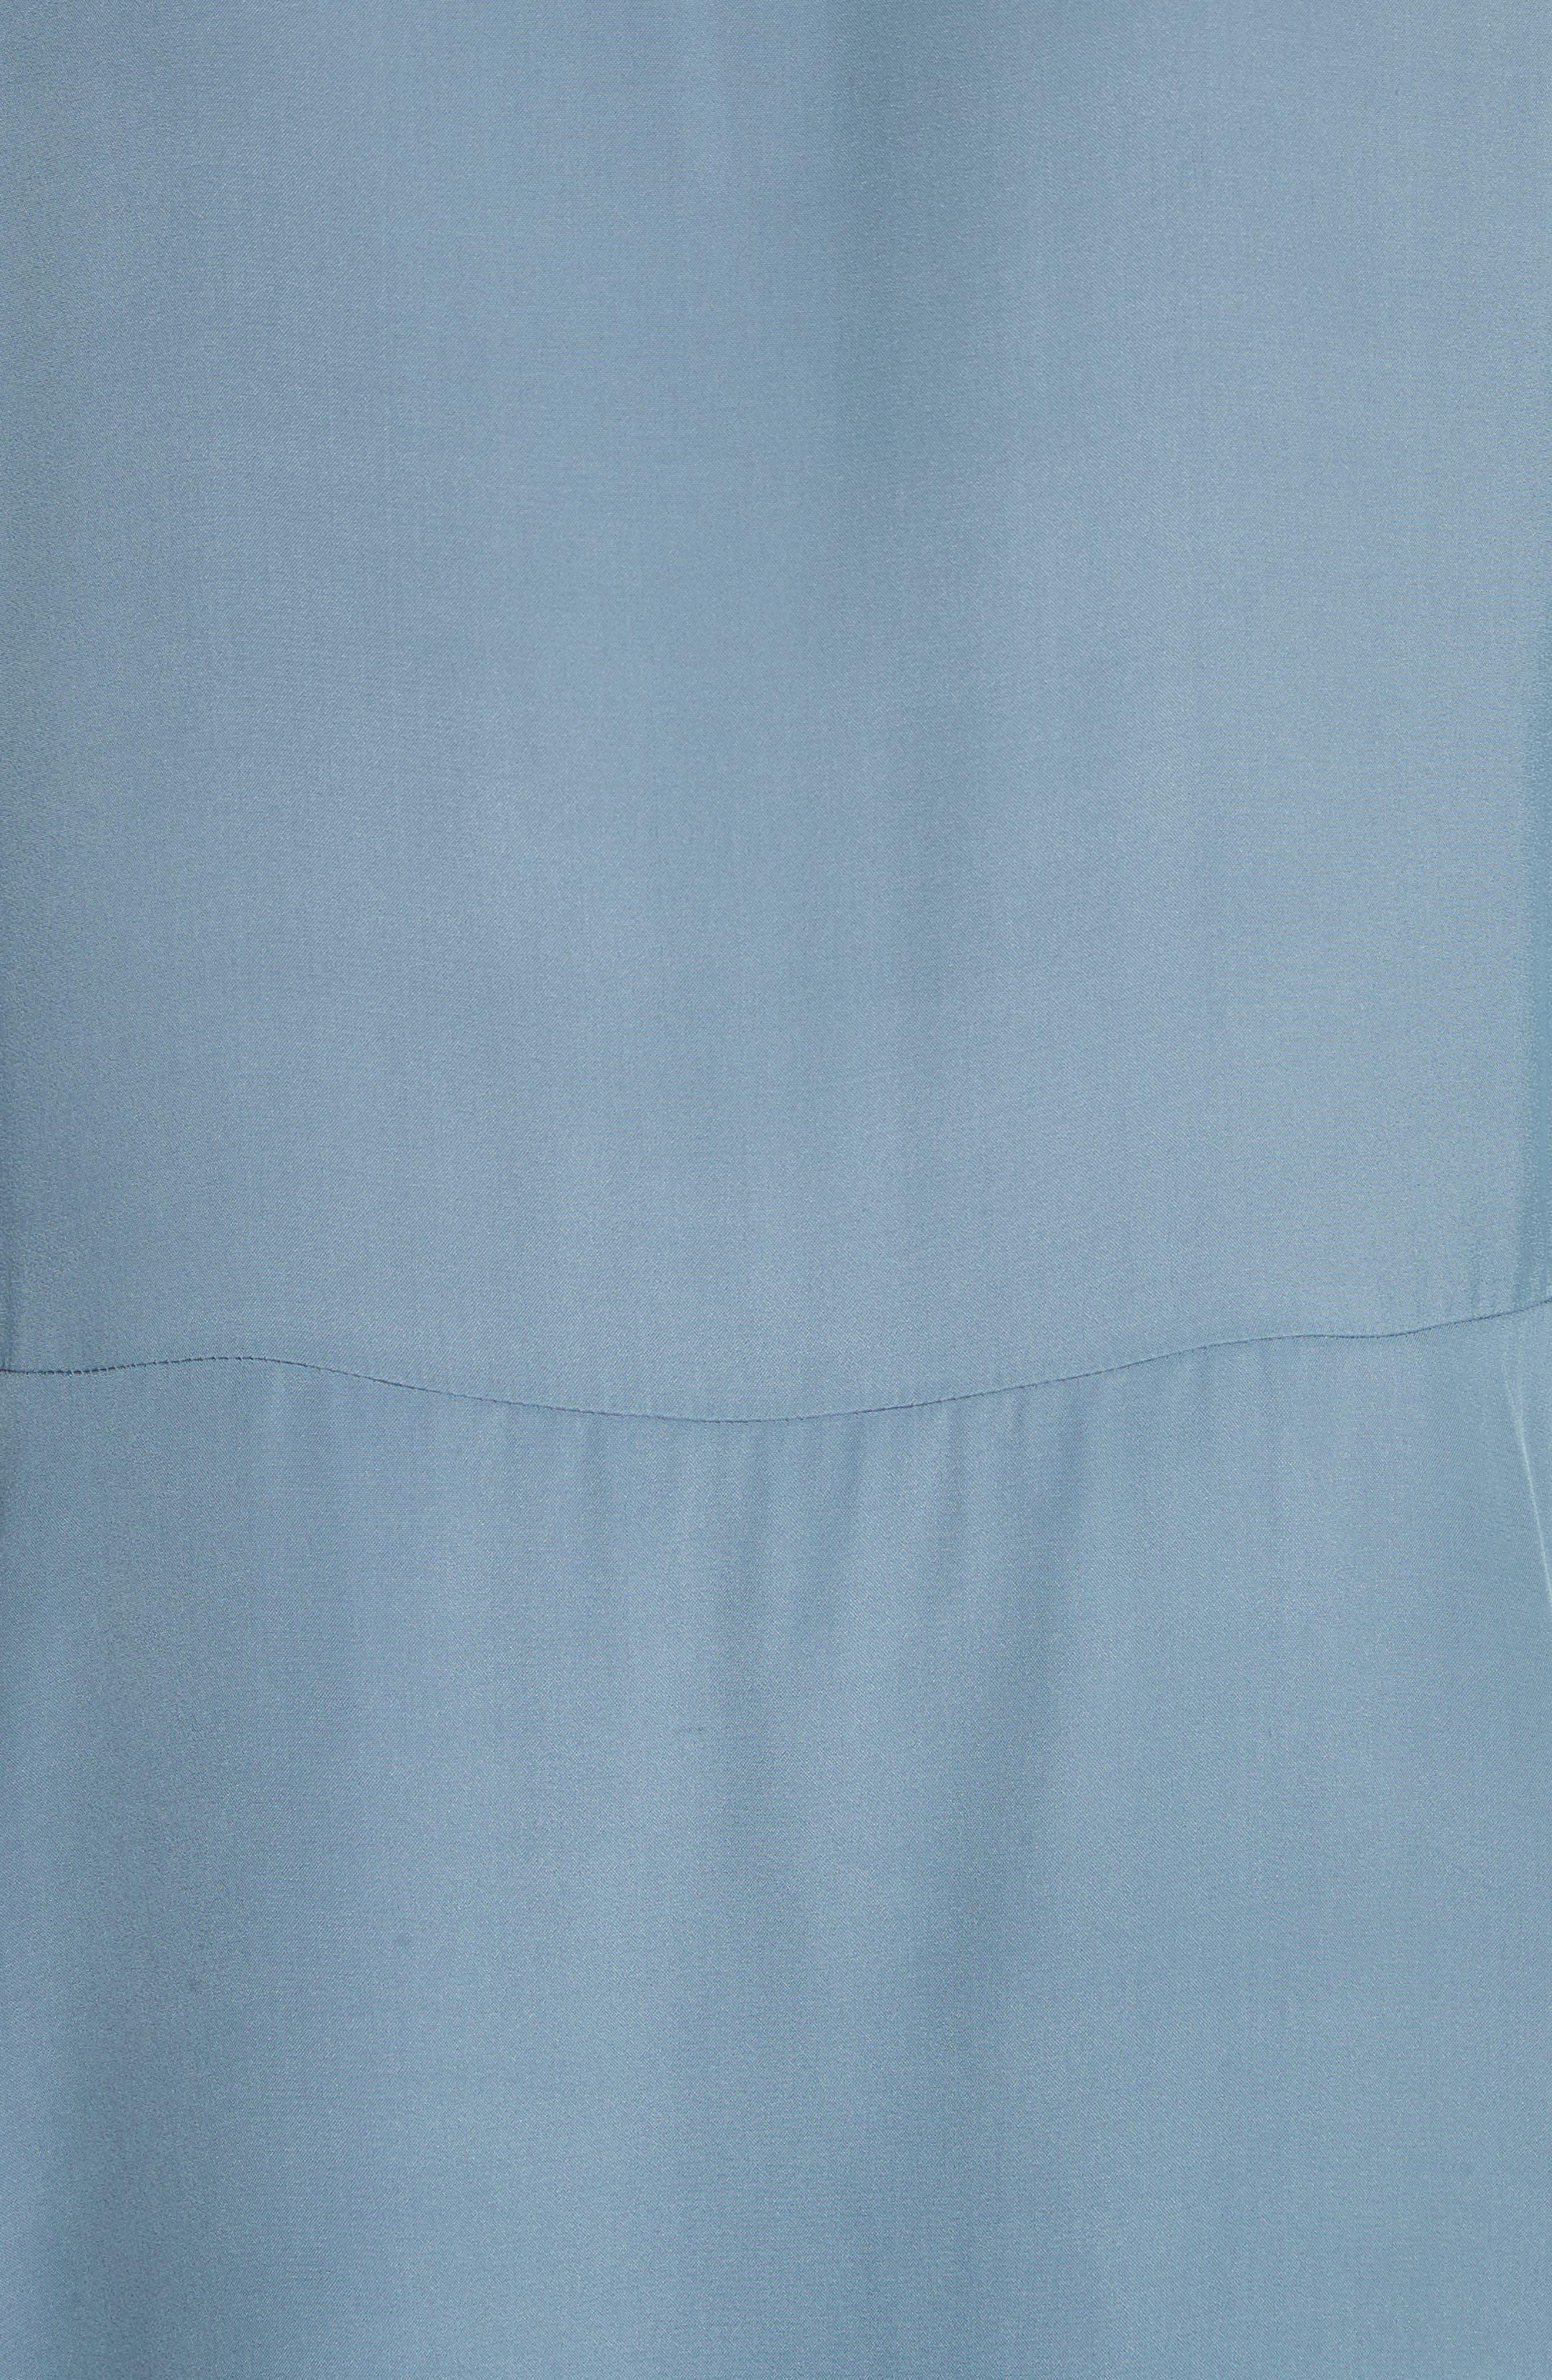 Tie Neck Ruffle Hem Dress,                             Alternate thumbnail 6, color,                             MIRAGE BLUE